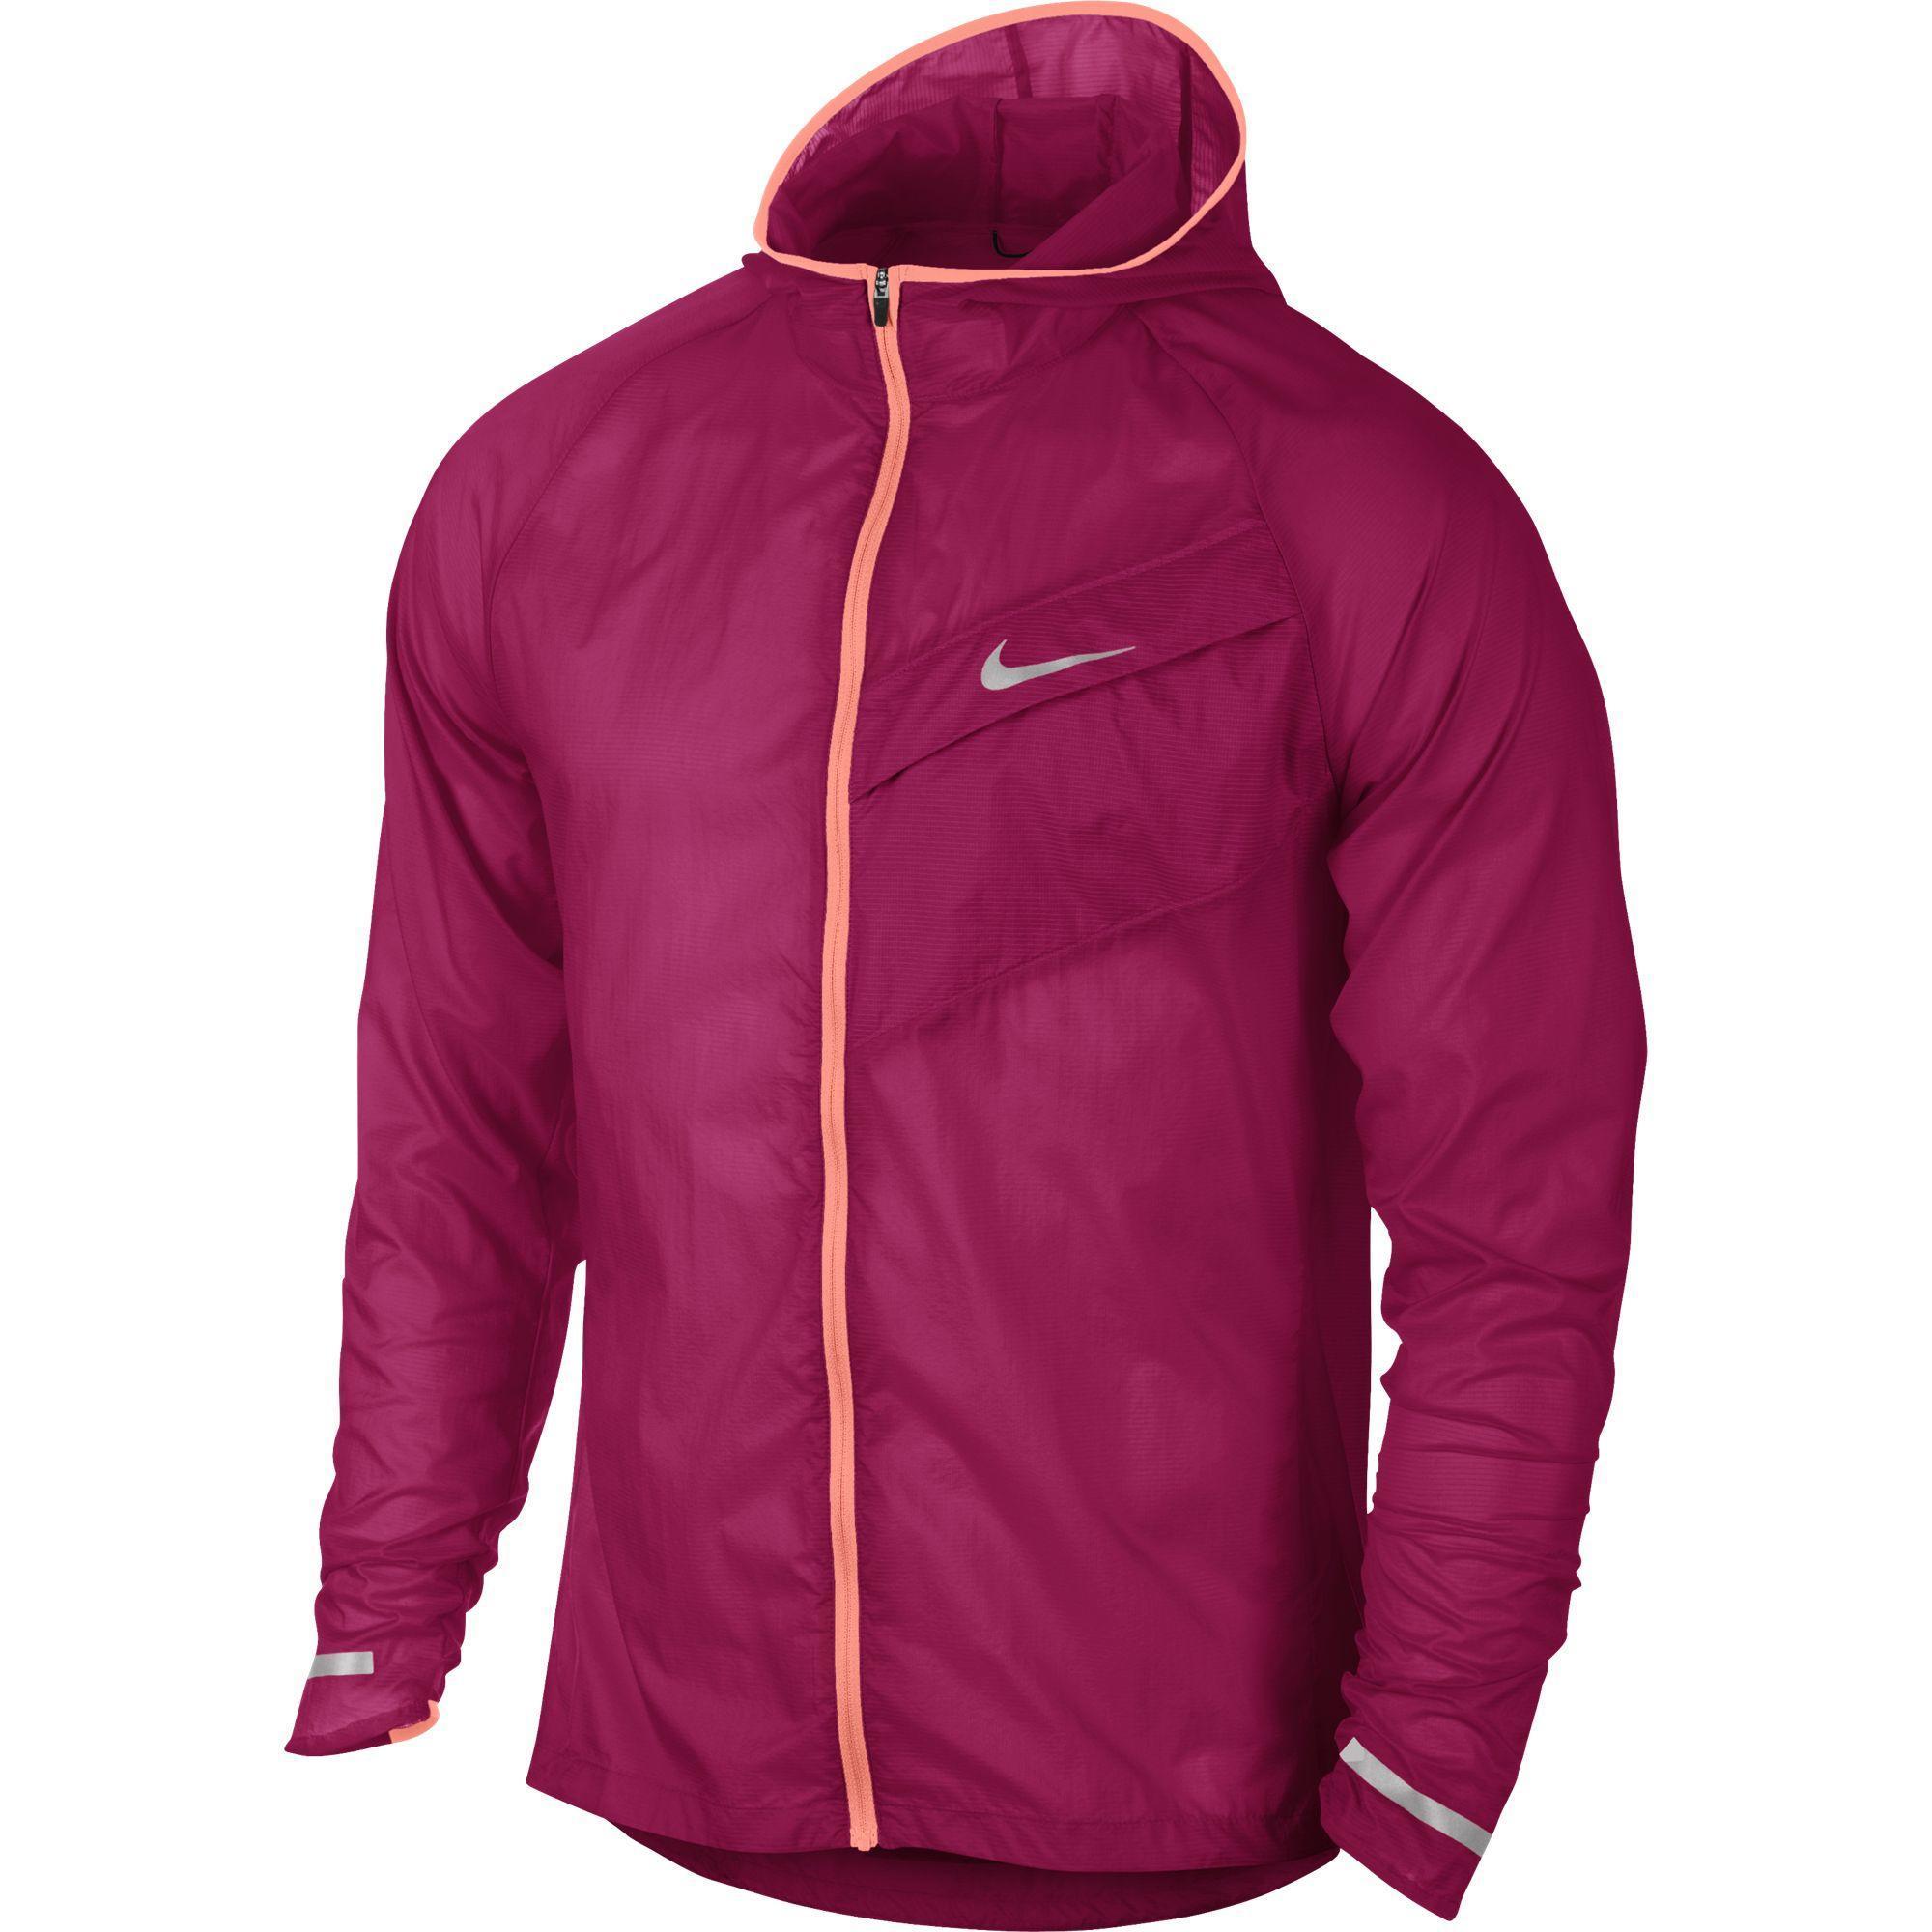 81708a9a0ab7 Nike Mens Impossibly Light Running Jacket - Fuchsia - Tennisnuts.com